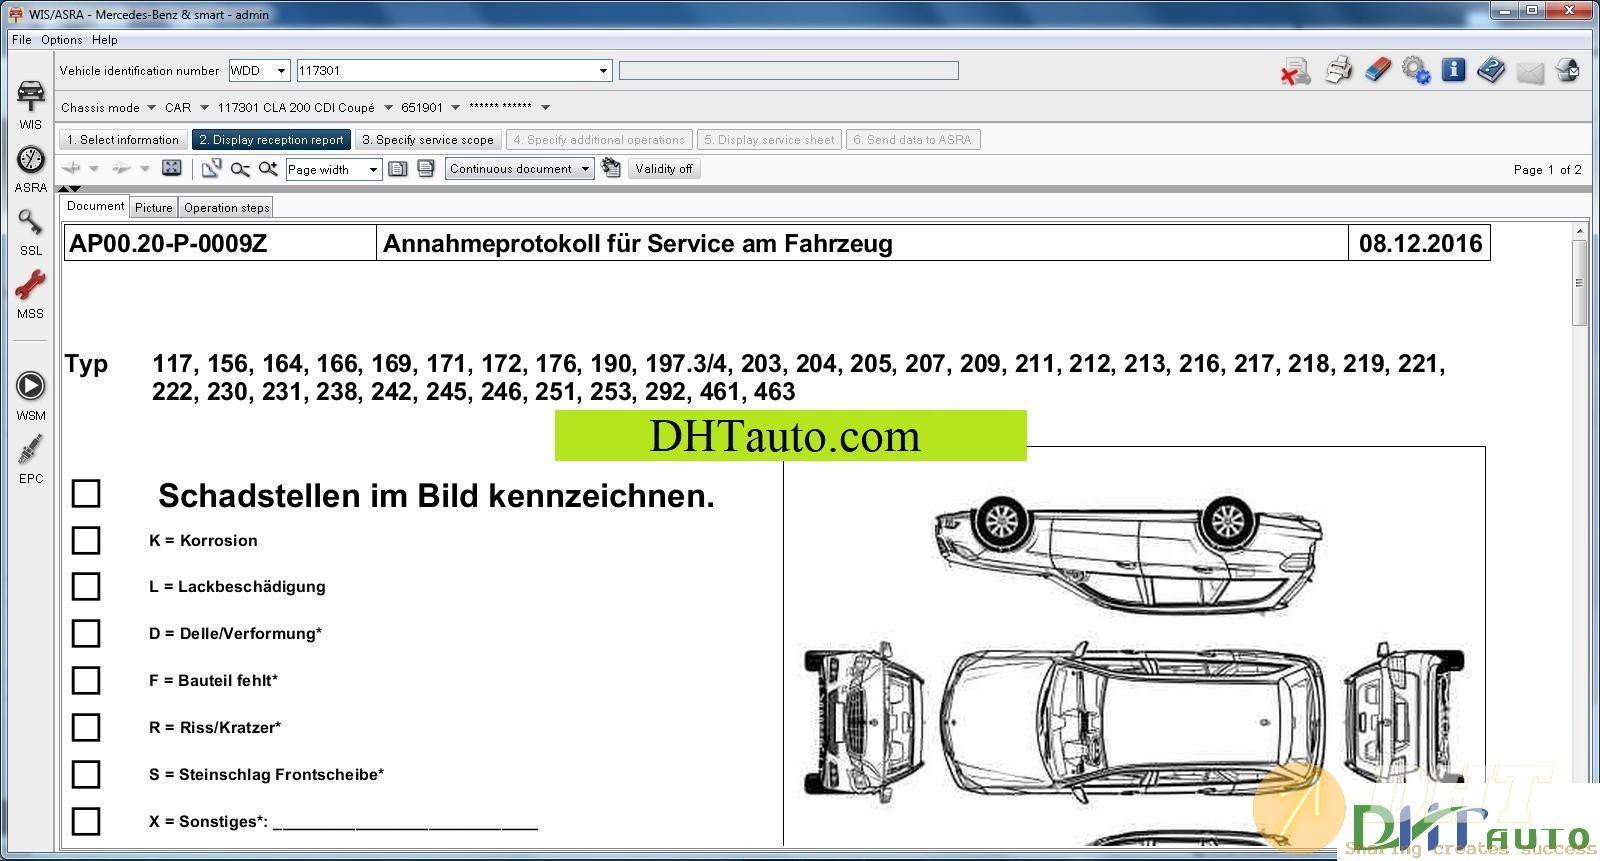 Mercedes-Benz-Epc-Instruction-KG-Full-01-2018-9.jpg